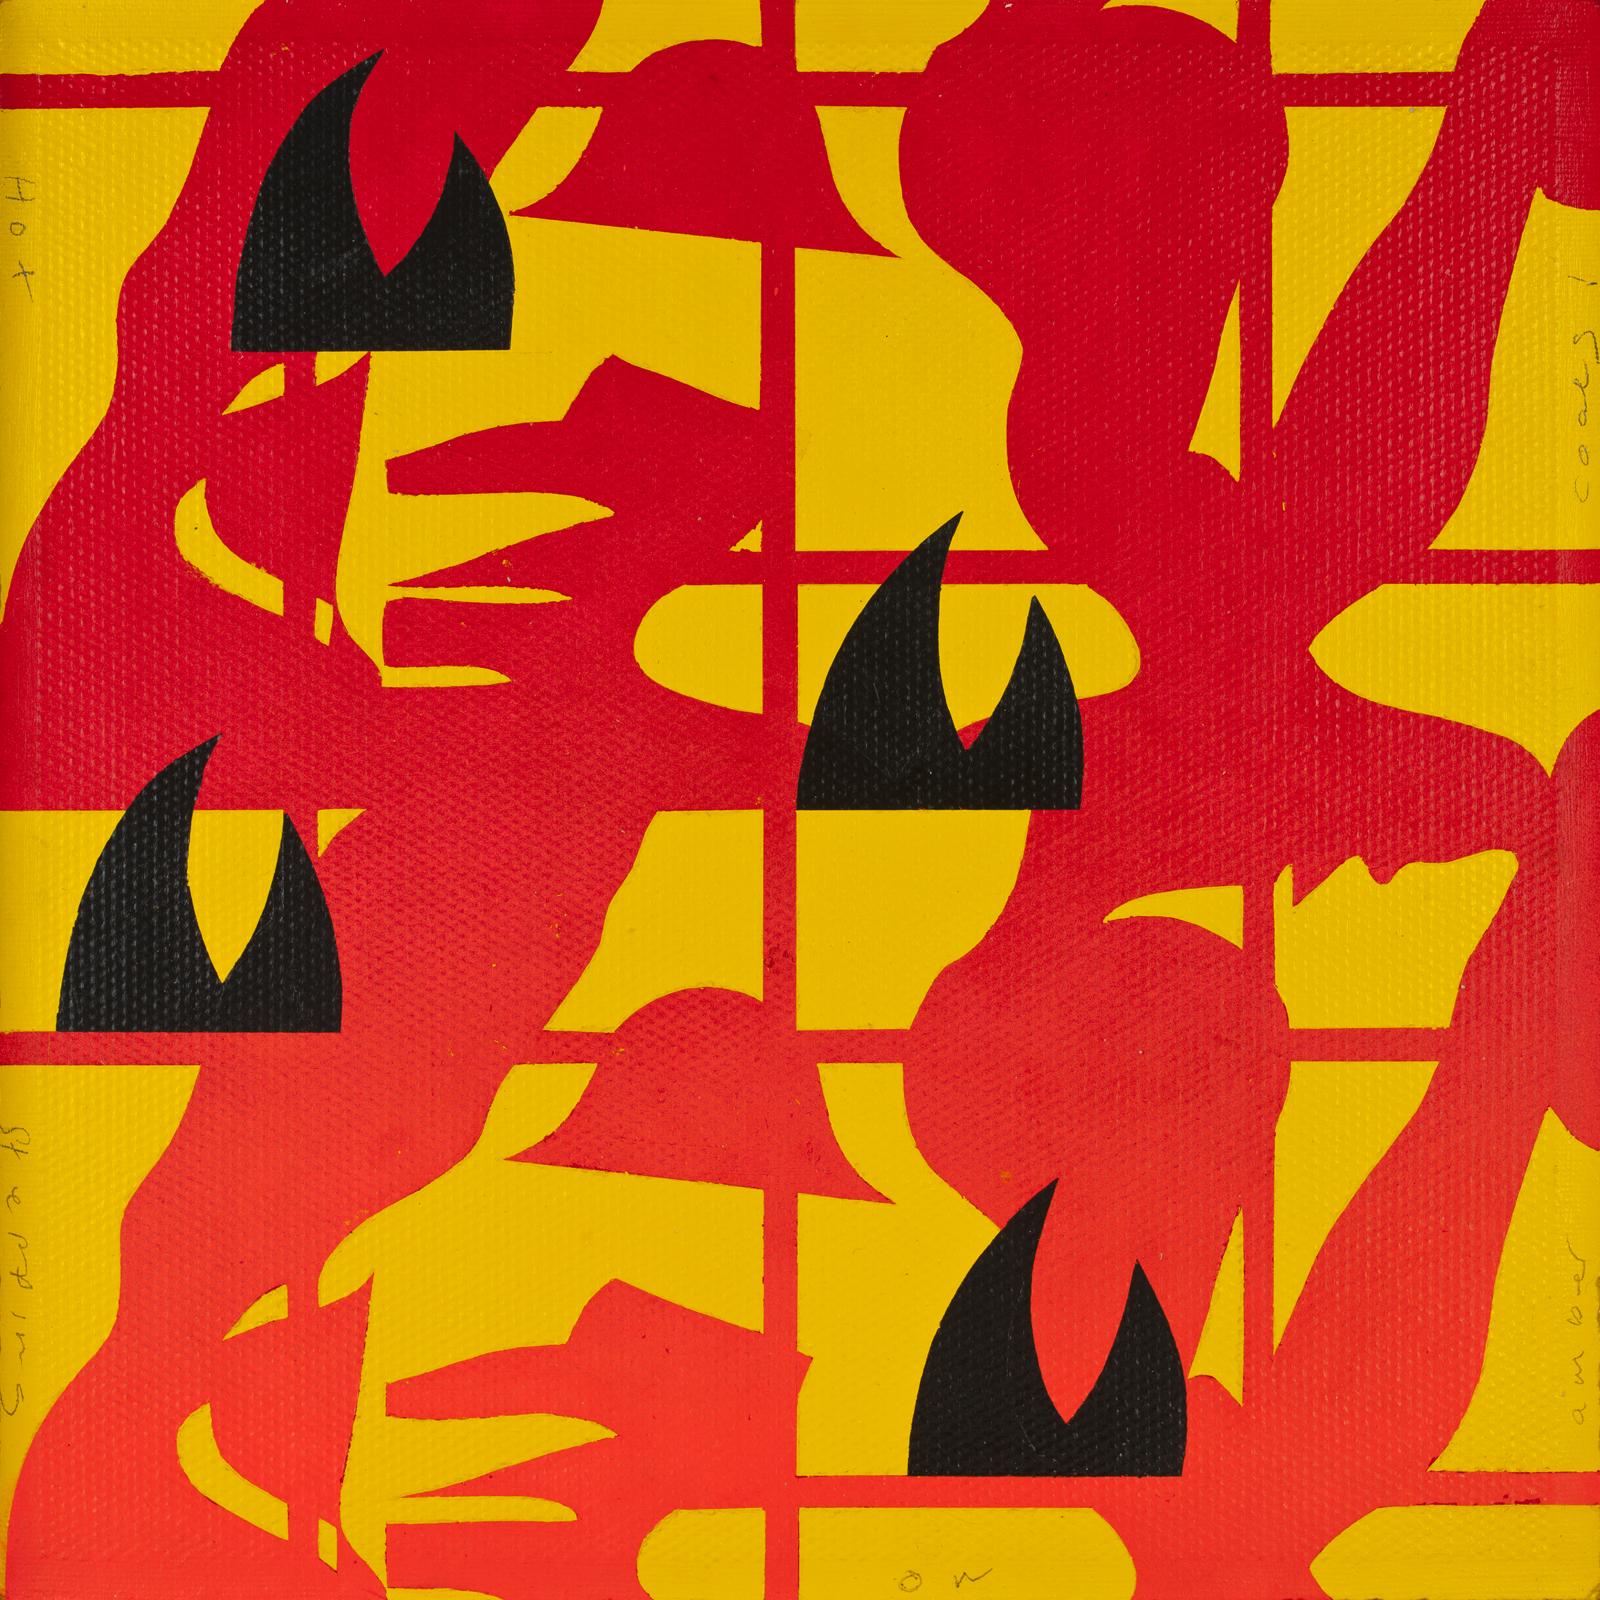 Pavement Lickers   H.Y.T. Studio